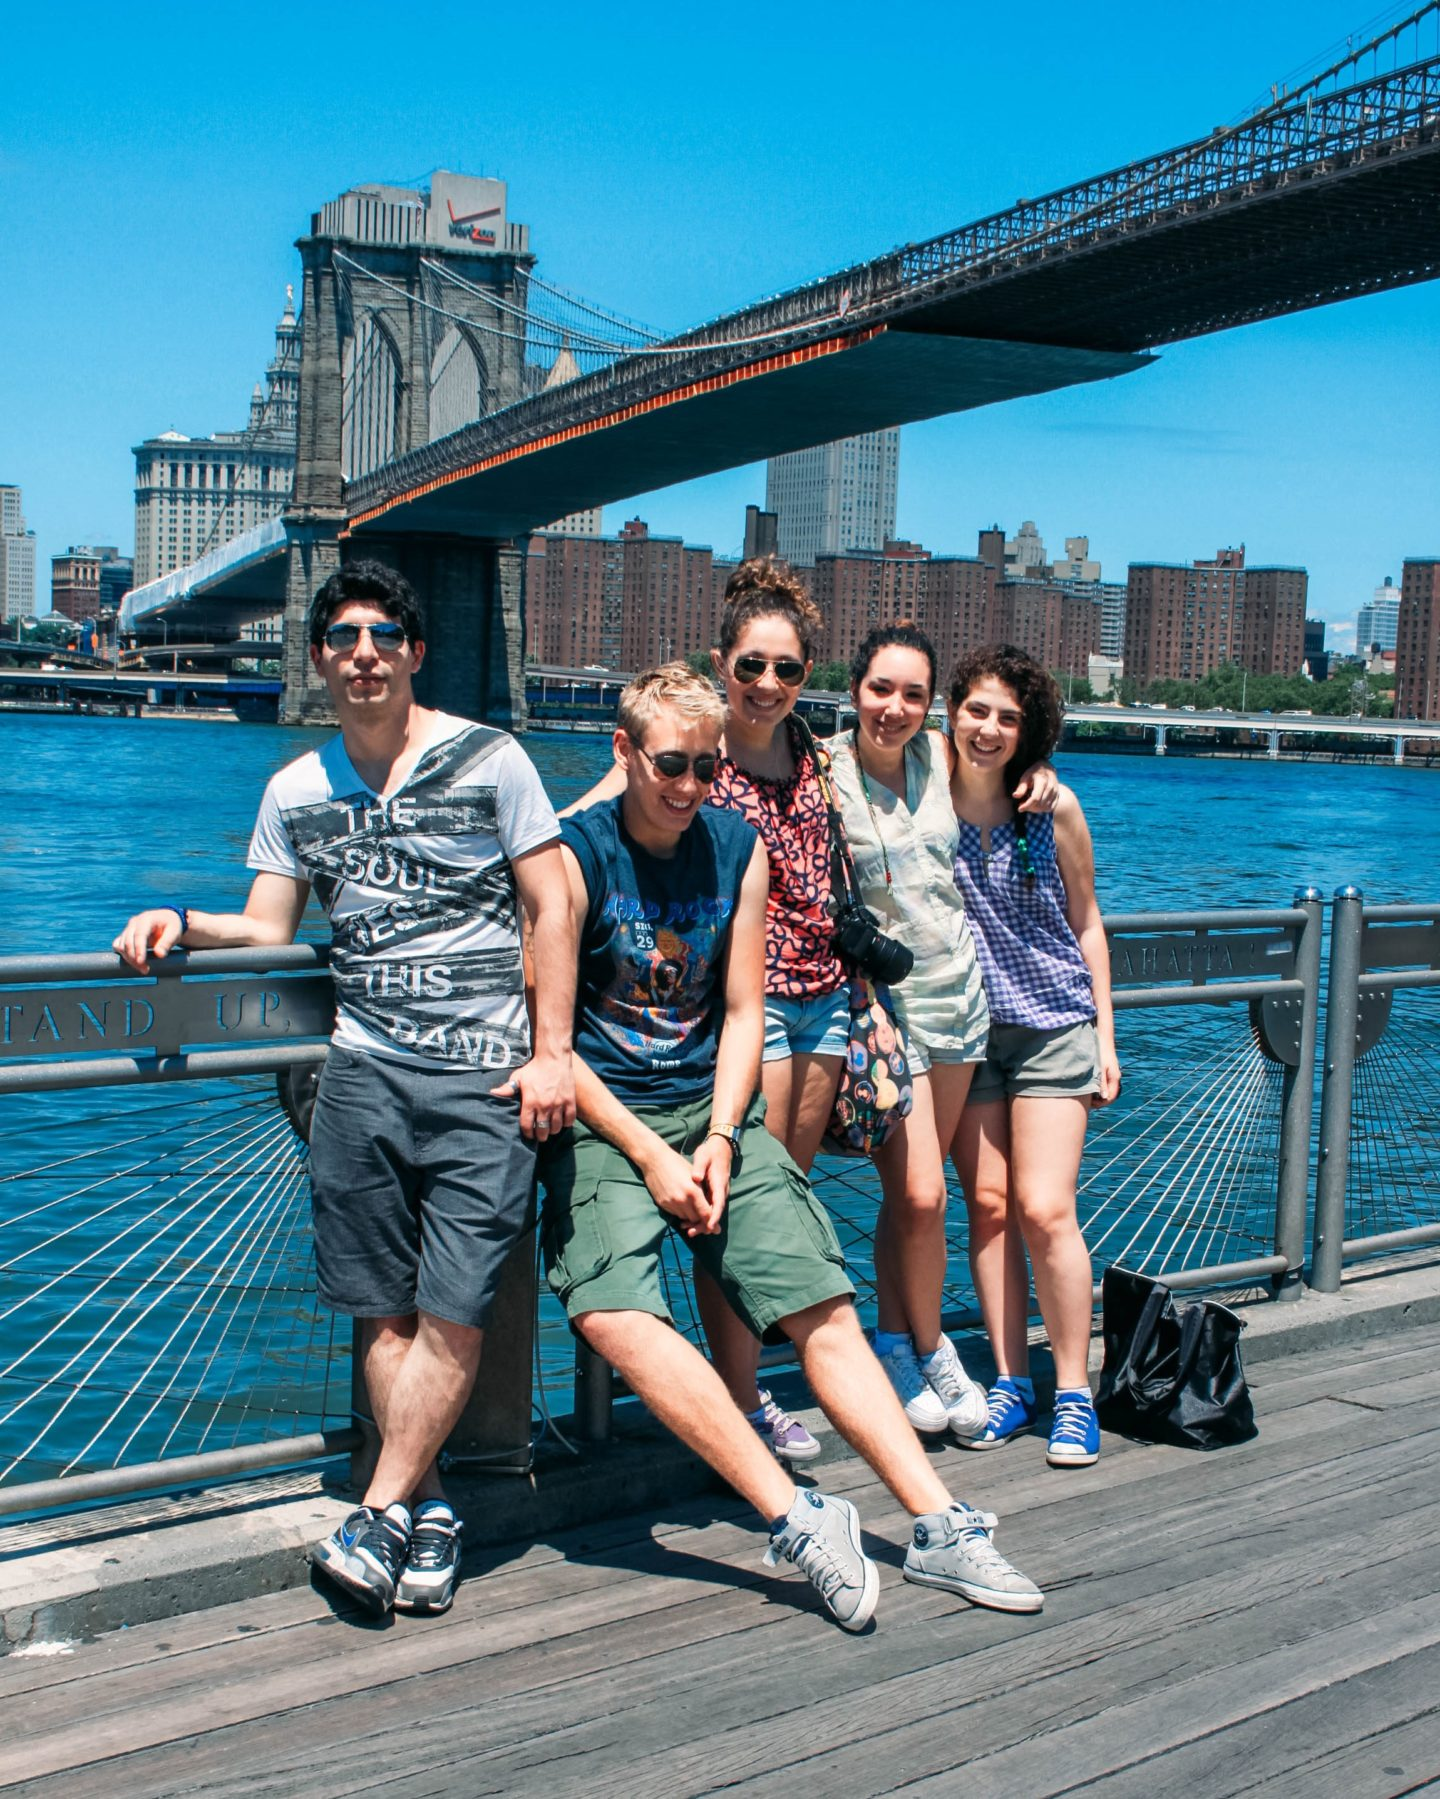 cinque ragazzi davanti a brooklyn bridge